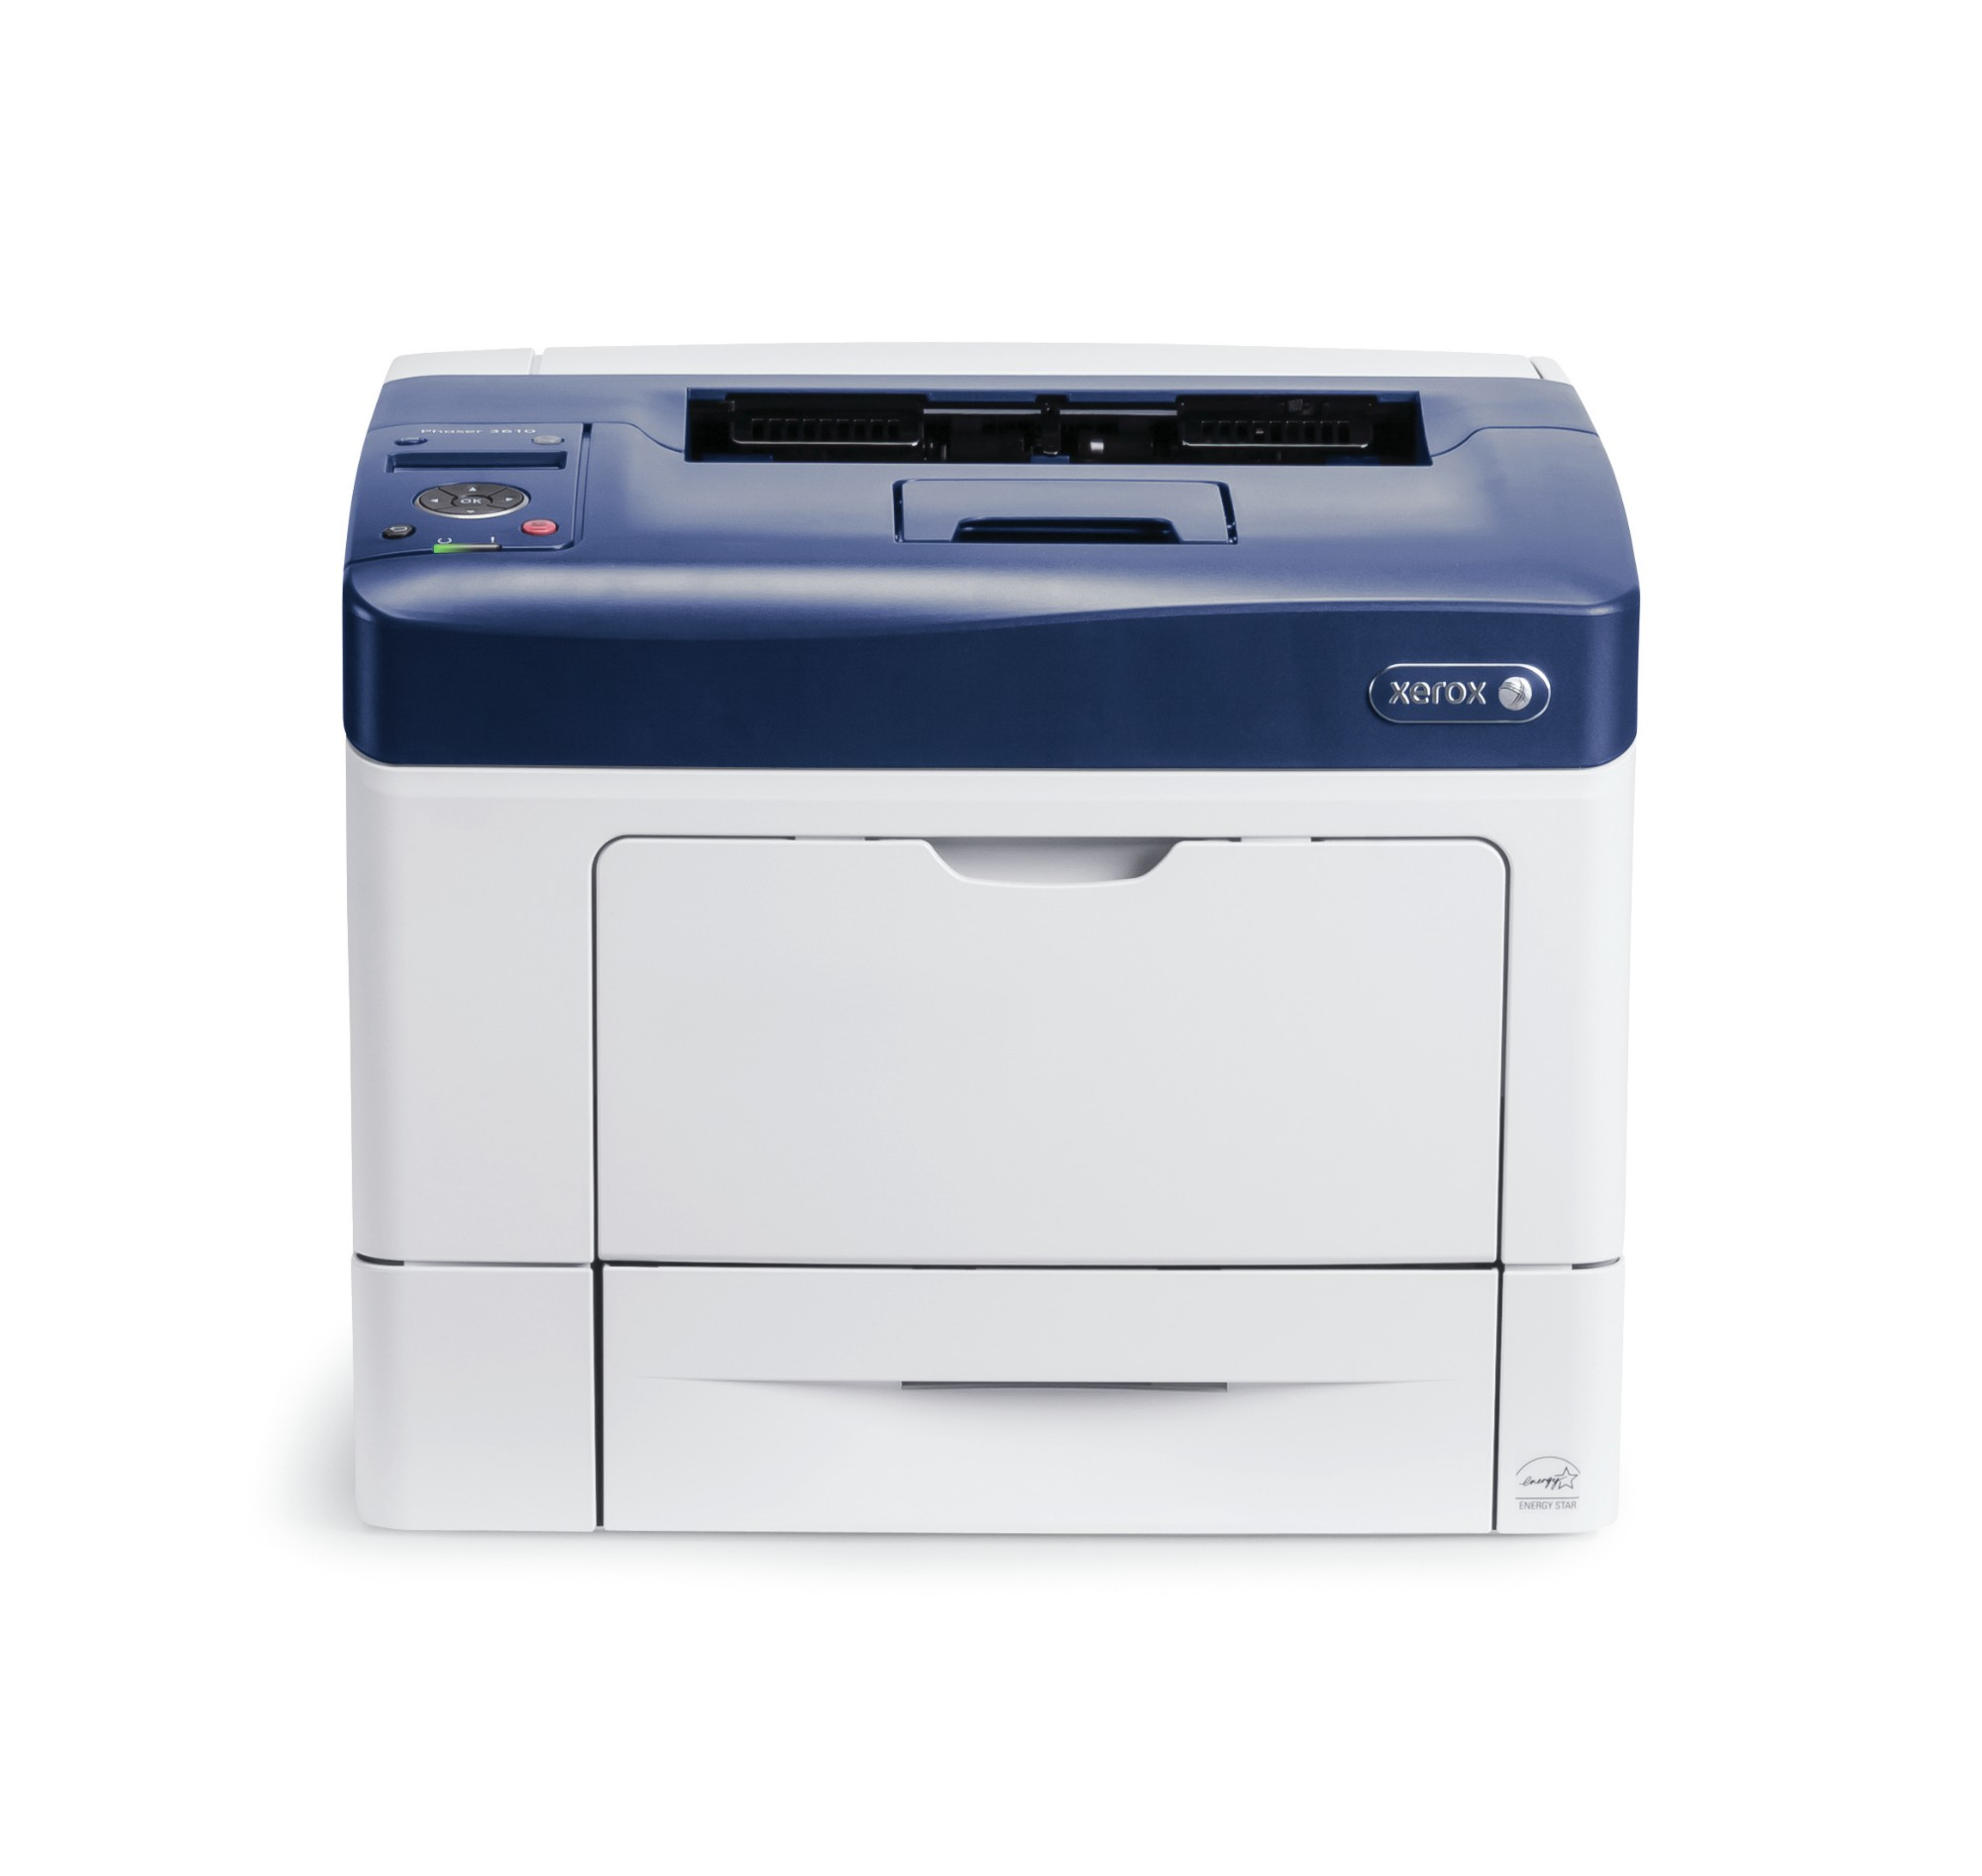 Xerox Phaser 3610V_DN 1200 x 1200DPI A4 laser printer